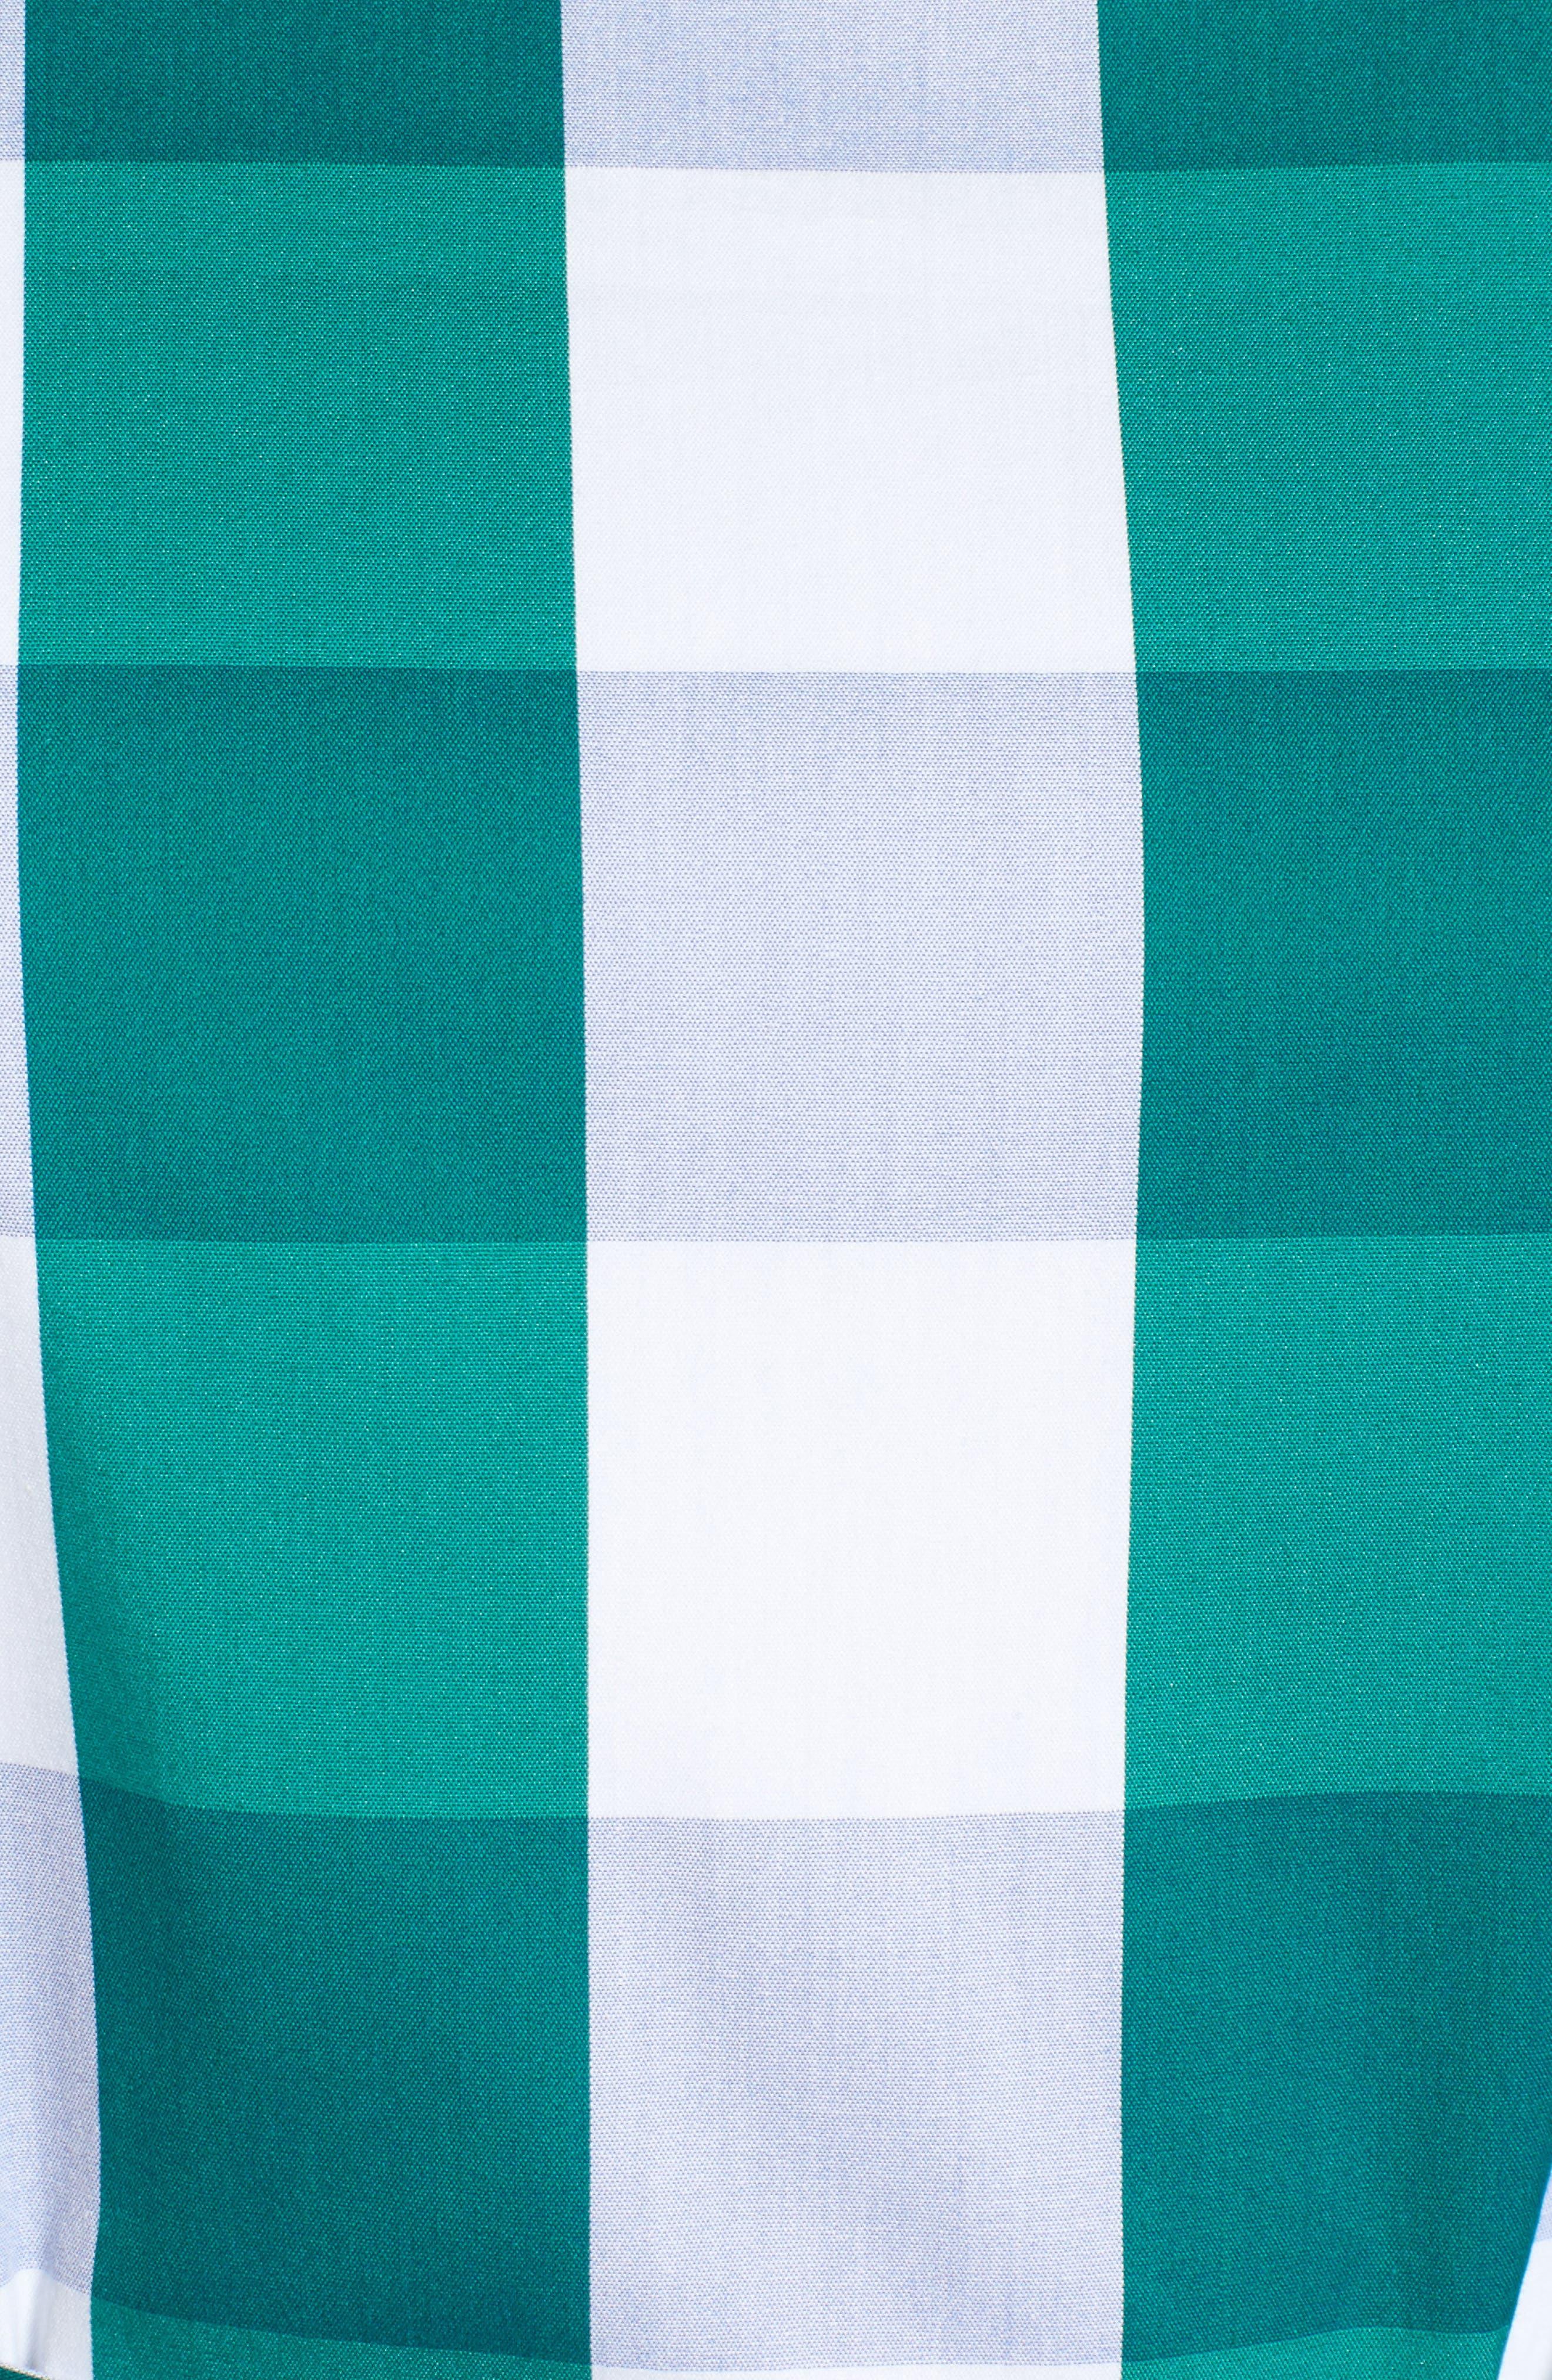 Ruffle & Bow Dress,                             Alternate thumbnail 6, color,                             Green- Blue Gingham